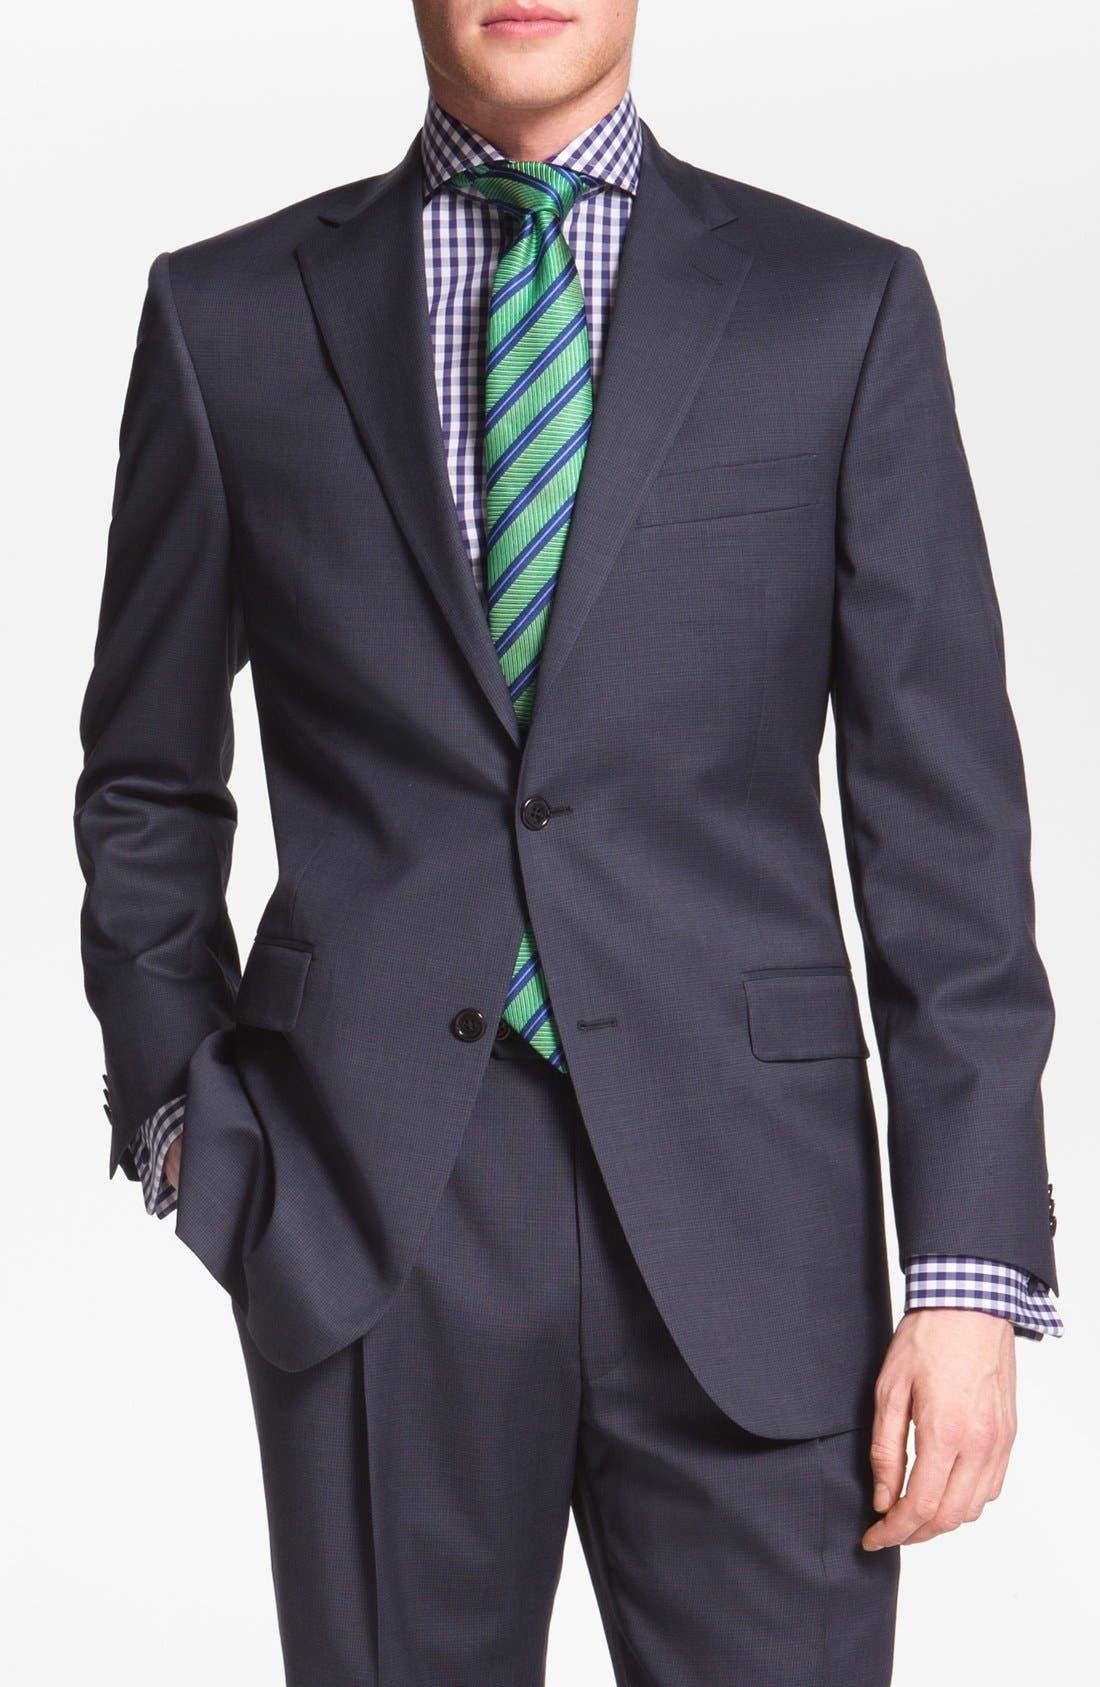 Alternate Image 1 Selected - Hart Schaffner Marx Worsted Wool Suit